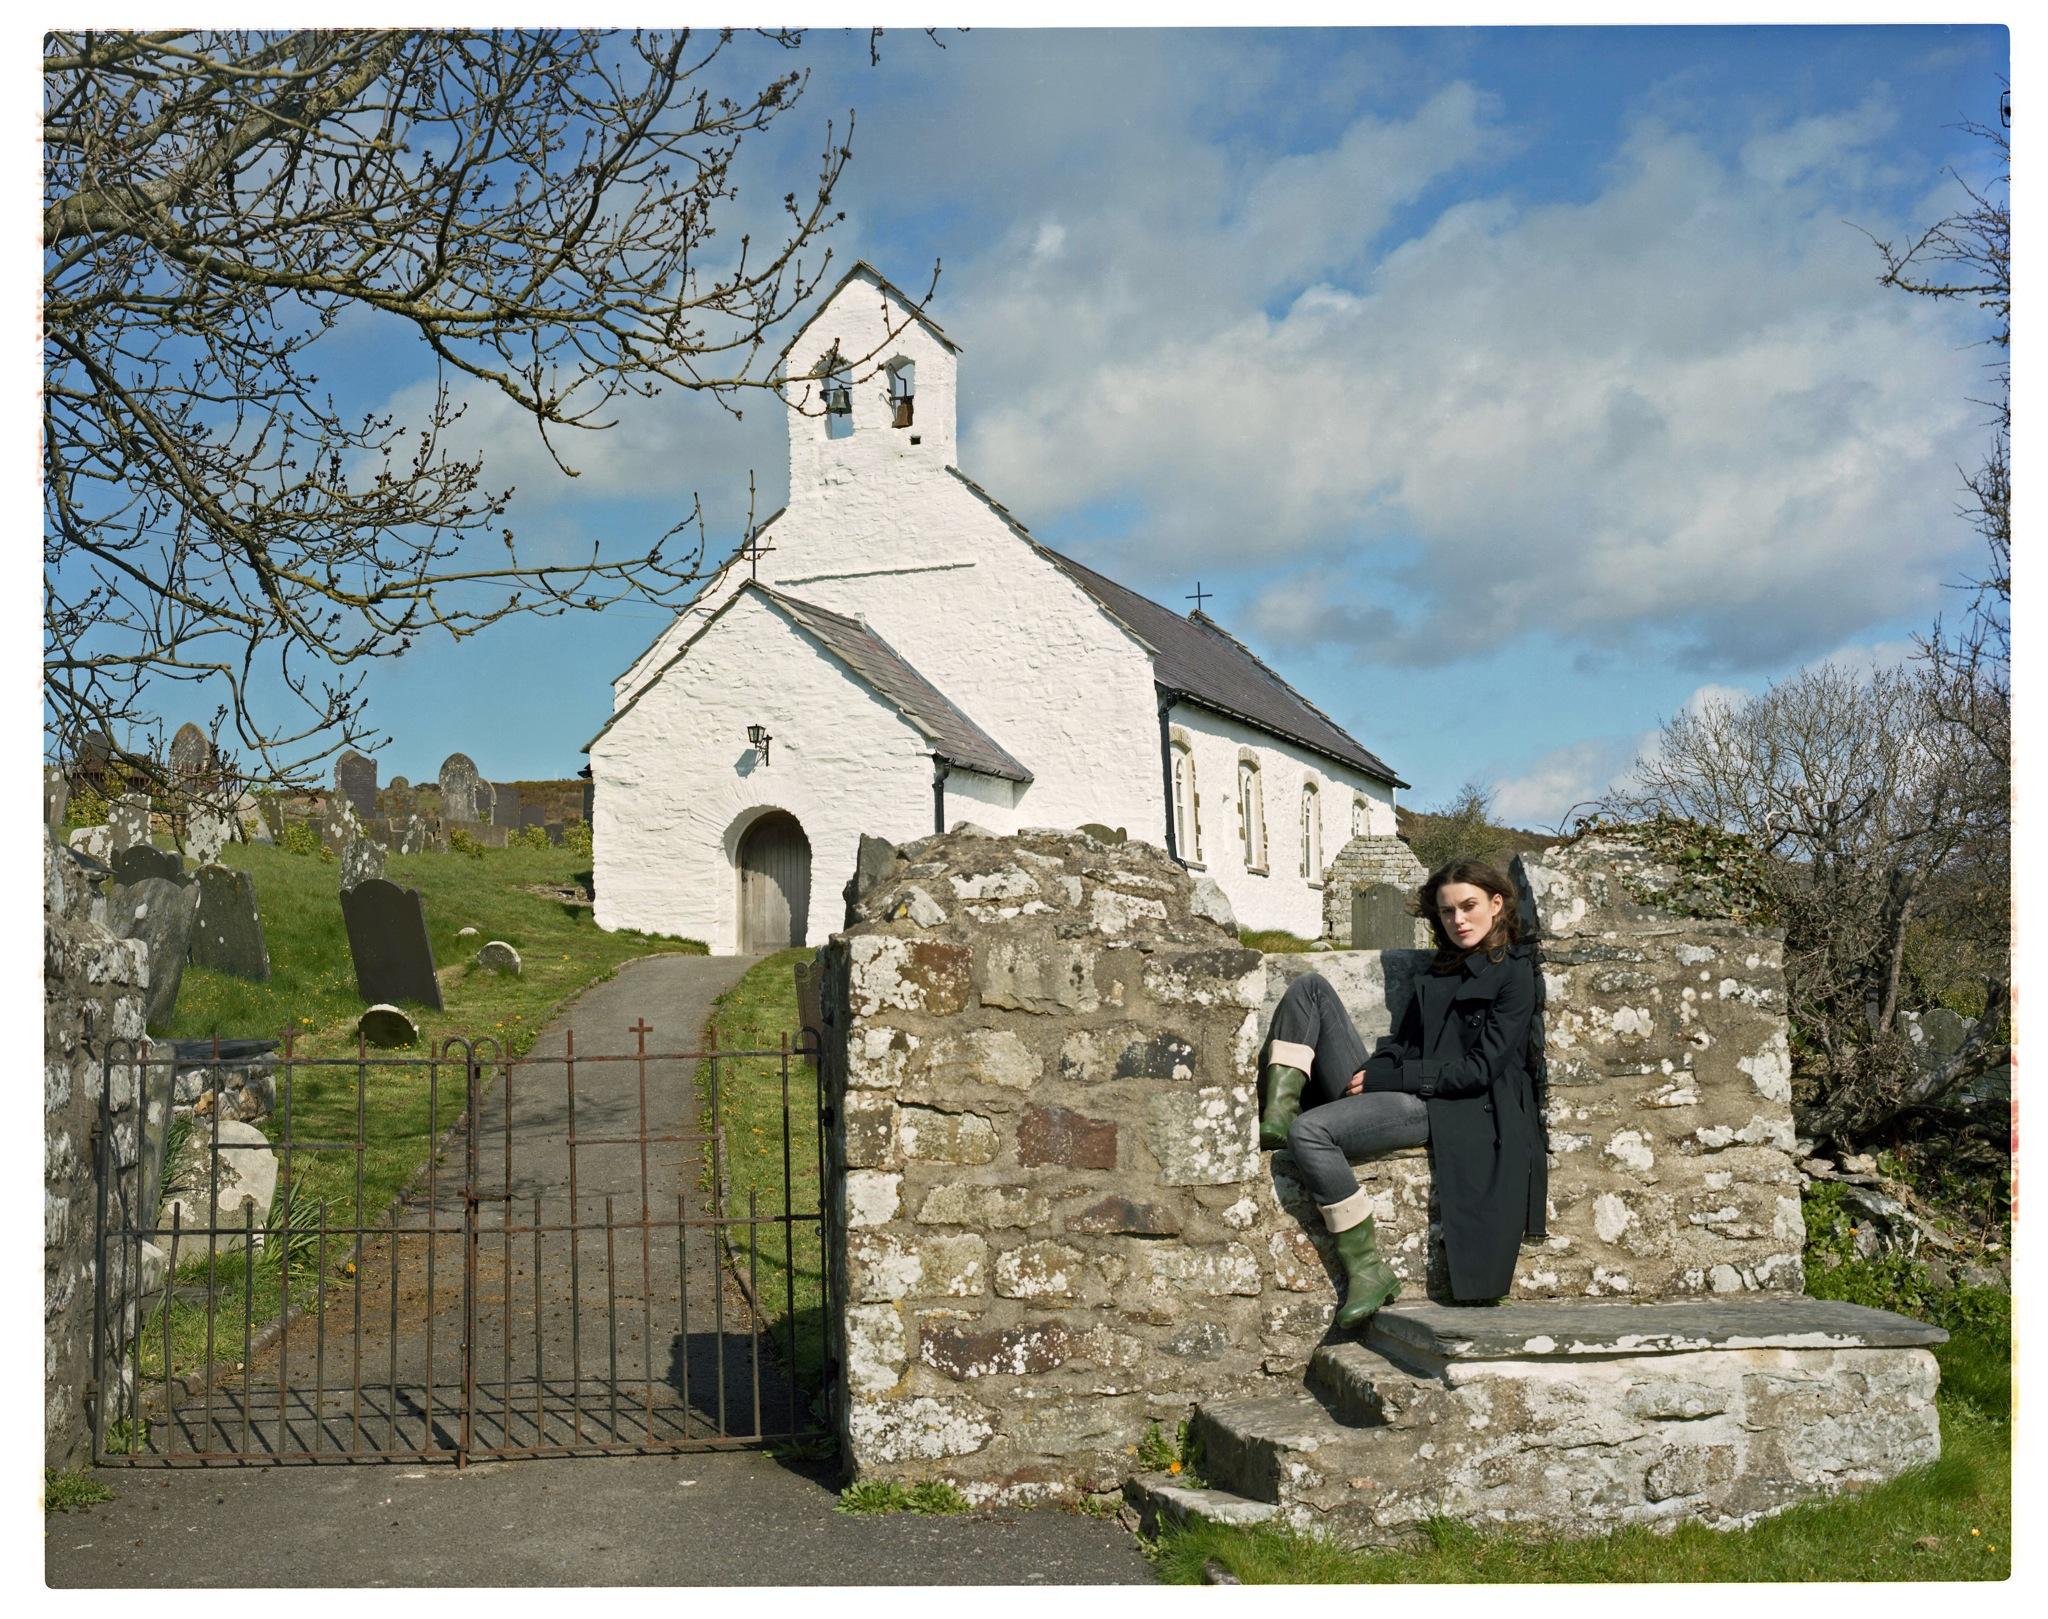 KeiraChurchWall Wales.jpg